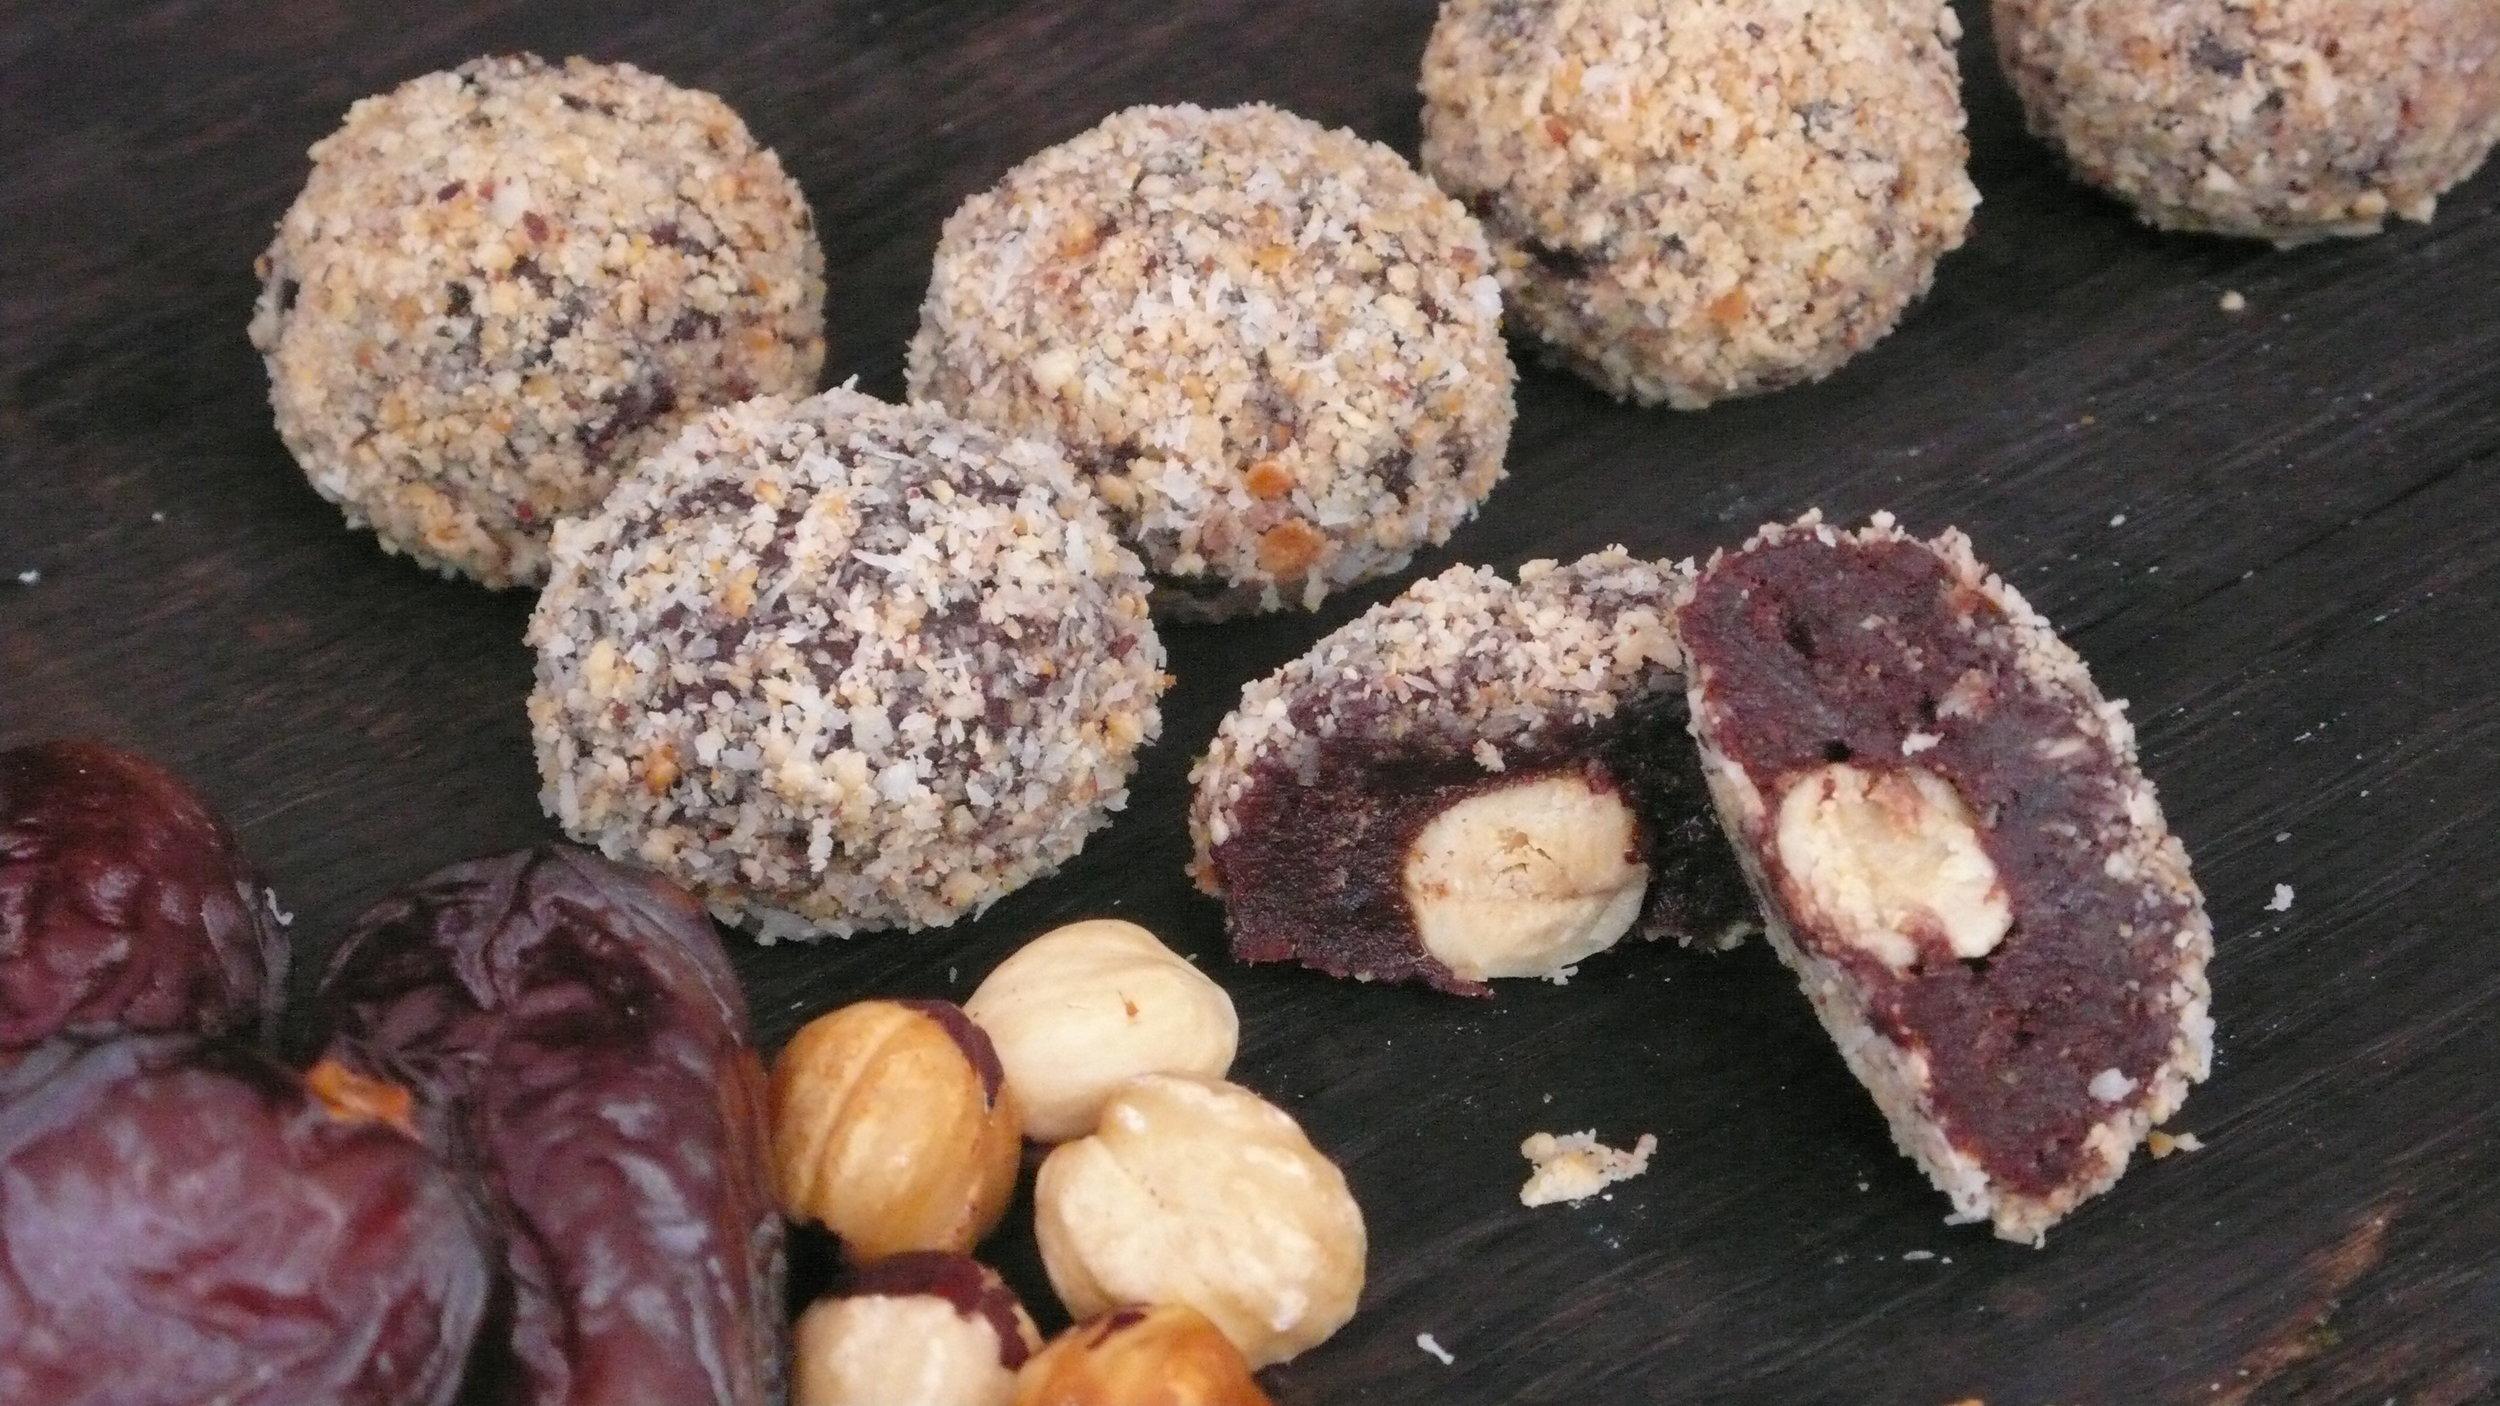 cacao date  ball with hazelnut coconut coating.JPG